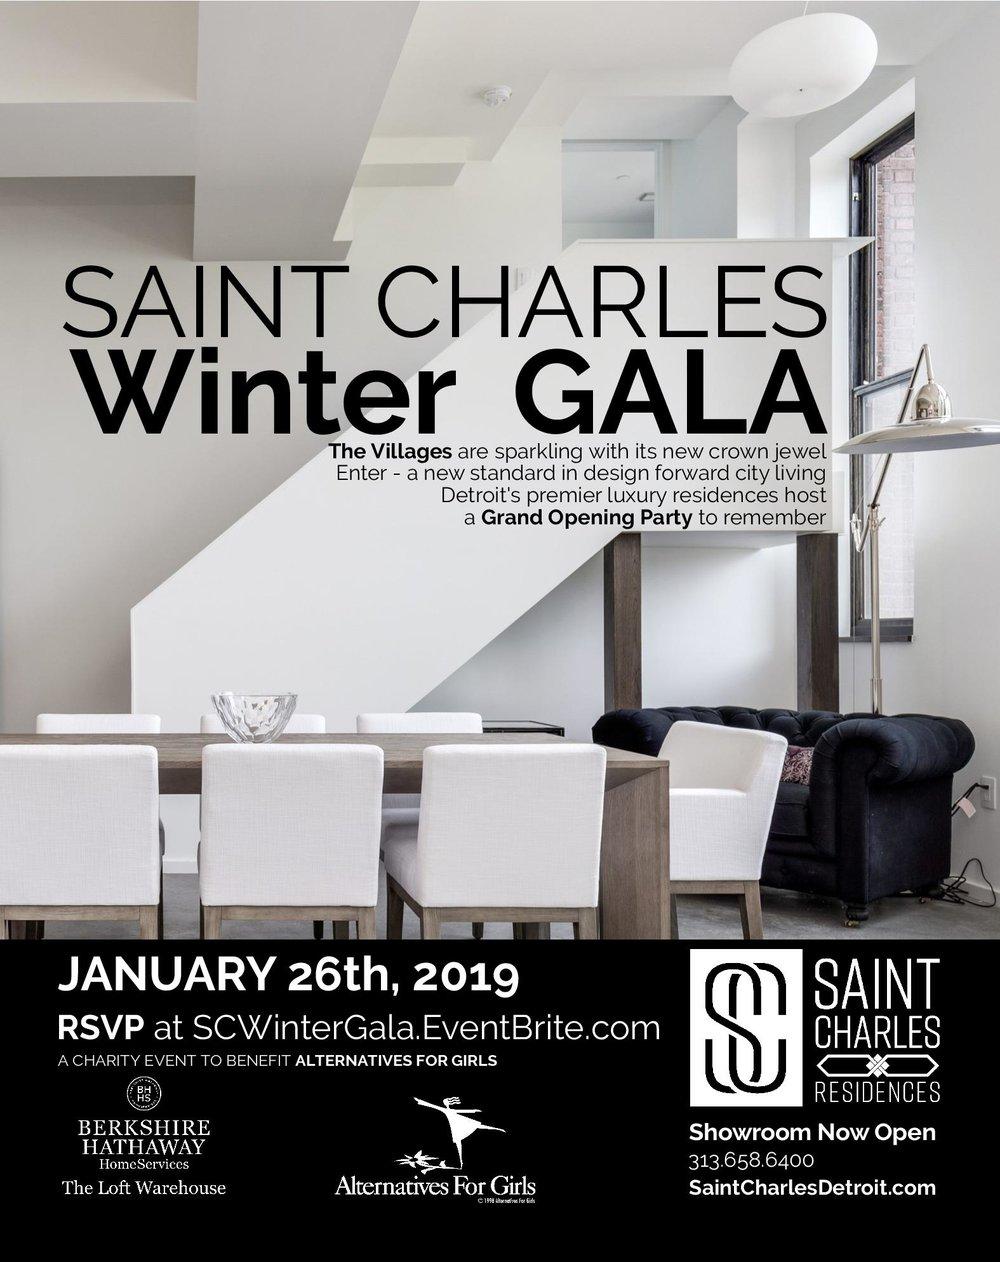 Saint Charles Winter Gala Hour FP Ad rev 2-page-001.jpg